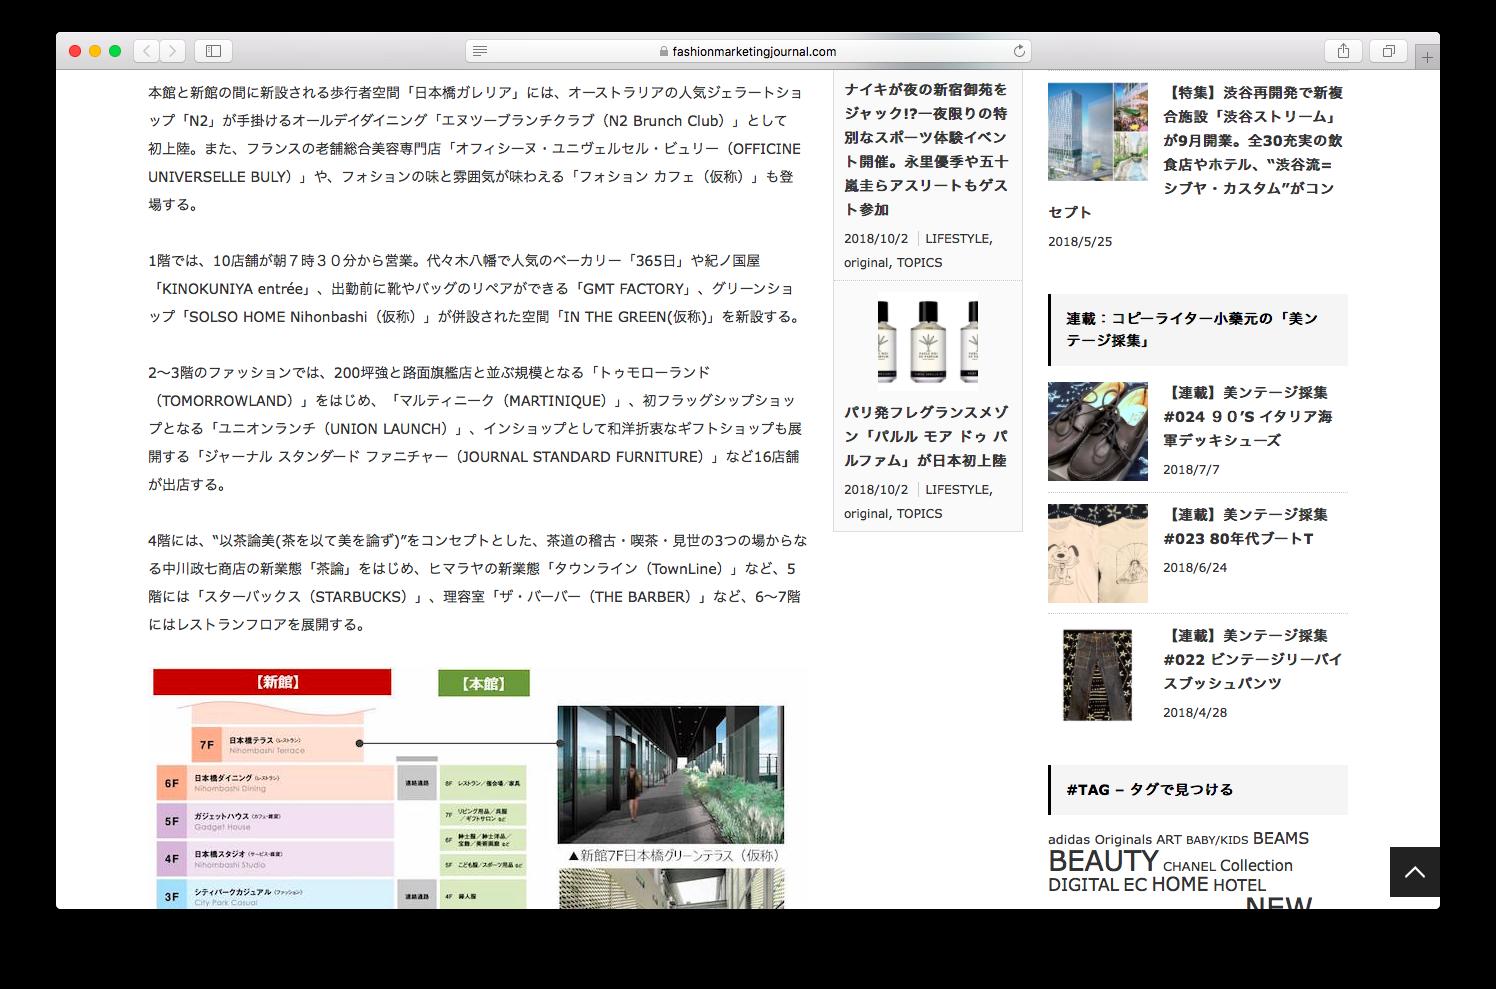 Fashion Marketing Journal